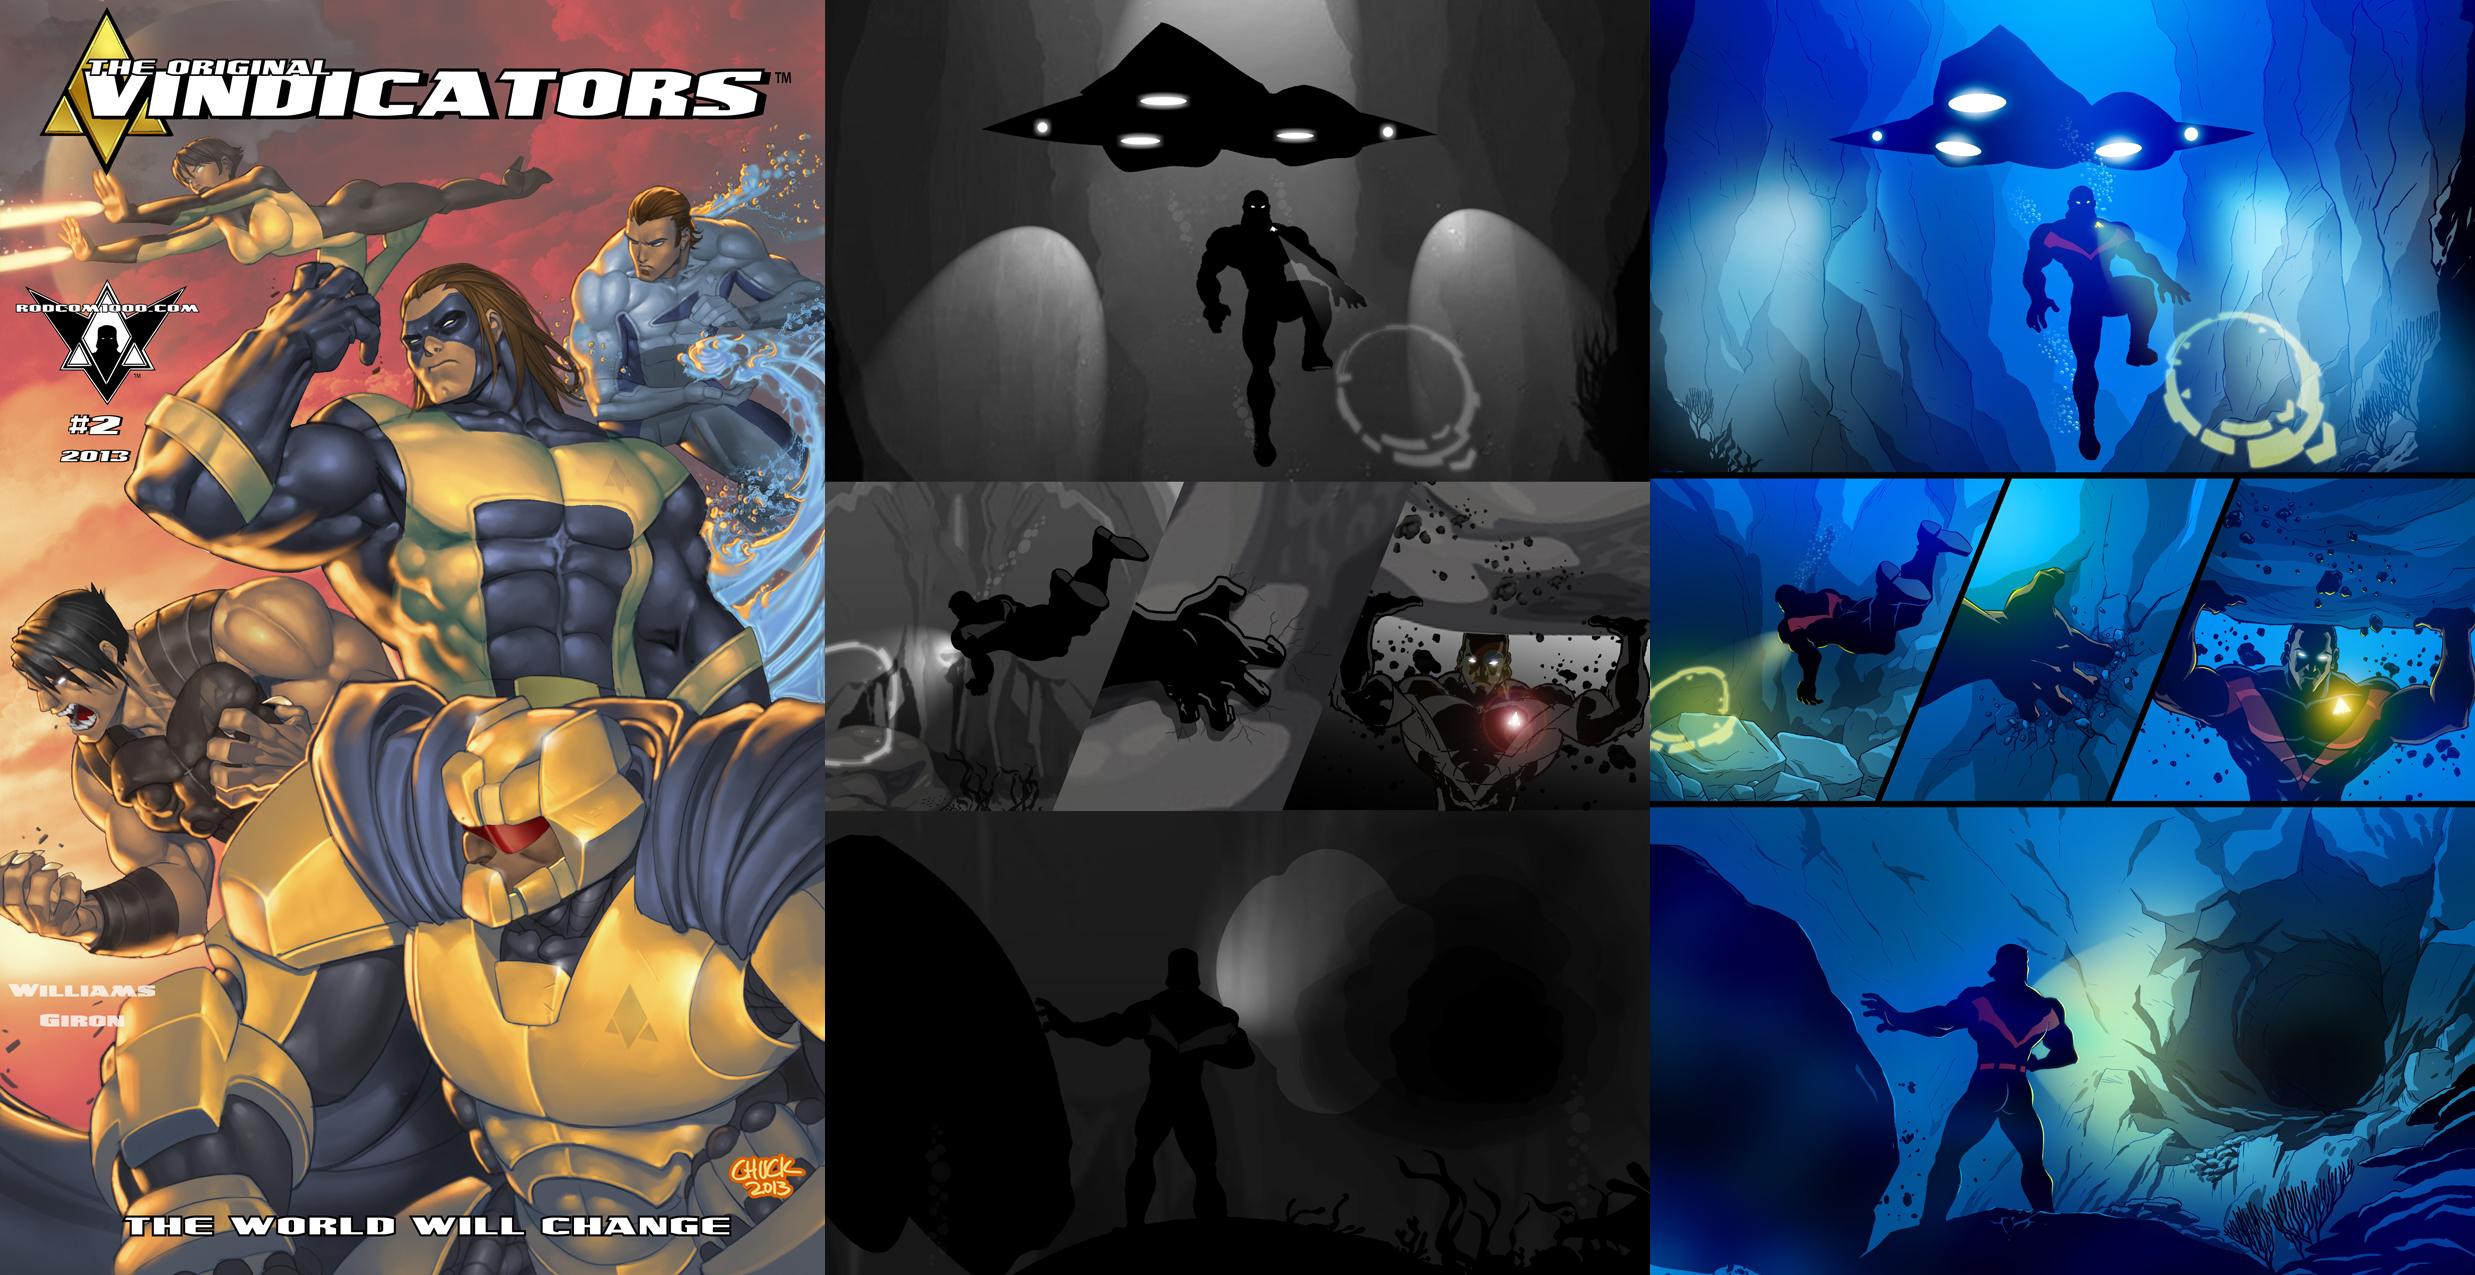 Original Vindicators #2